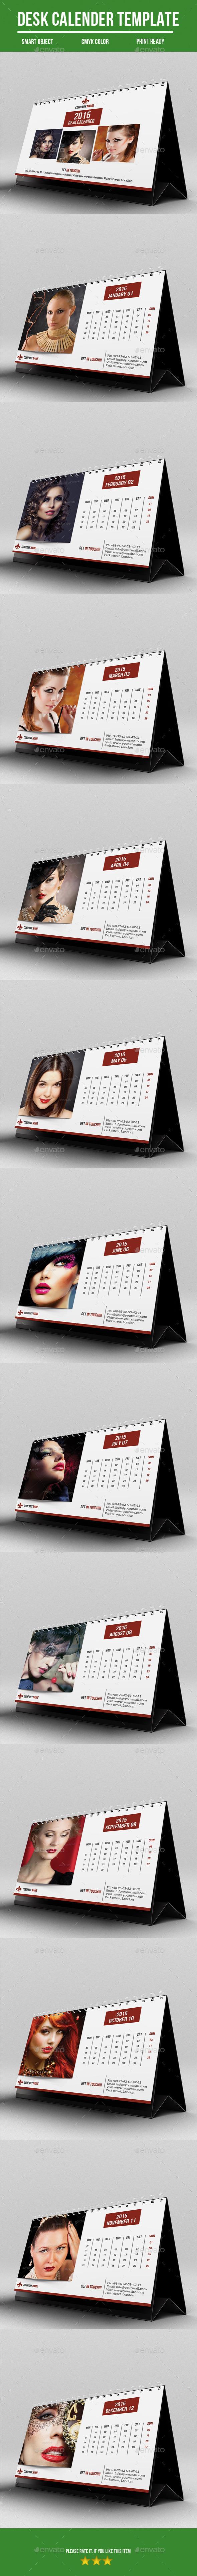 Desk Calender For 2015